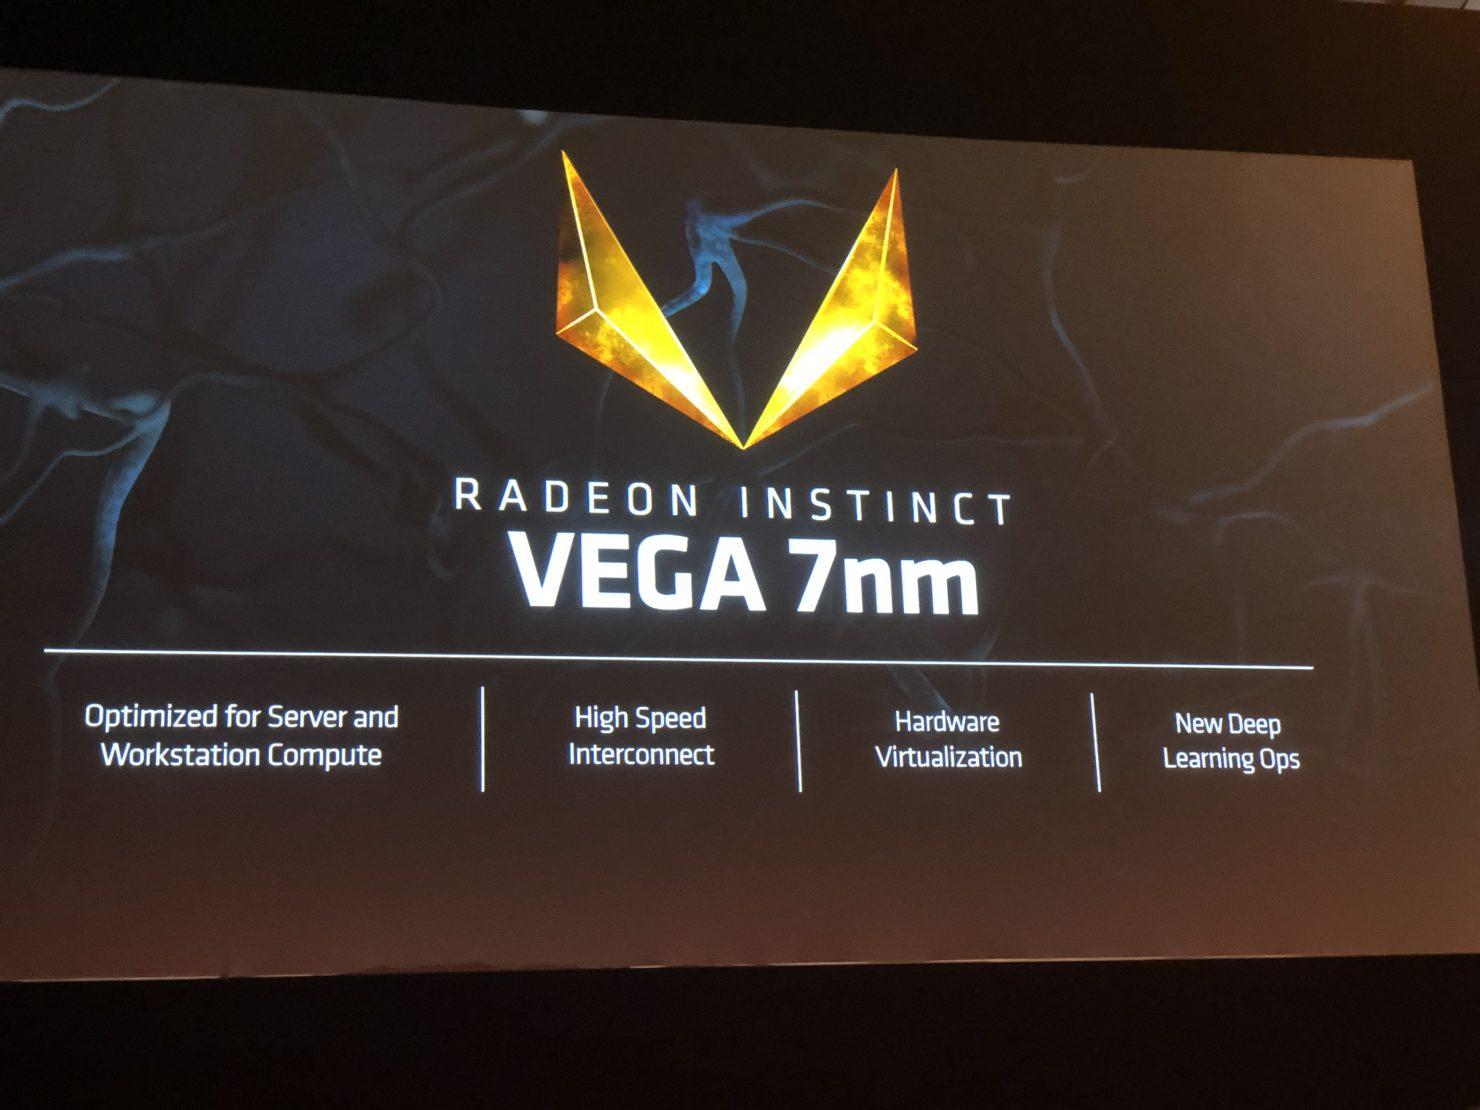 Computex 2018: AMD Launches Incredible 32GB 7nm Vega Instinct GPU